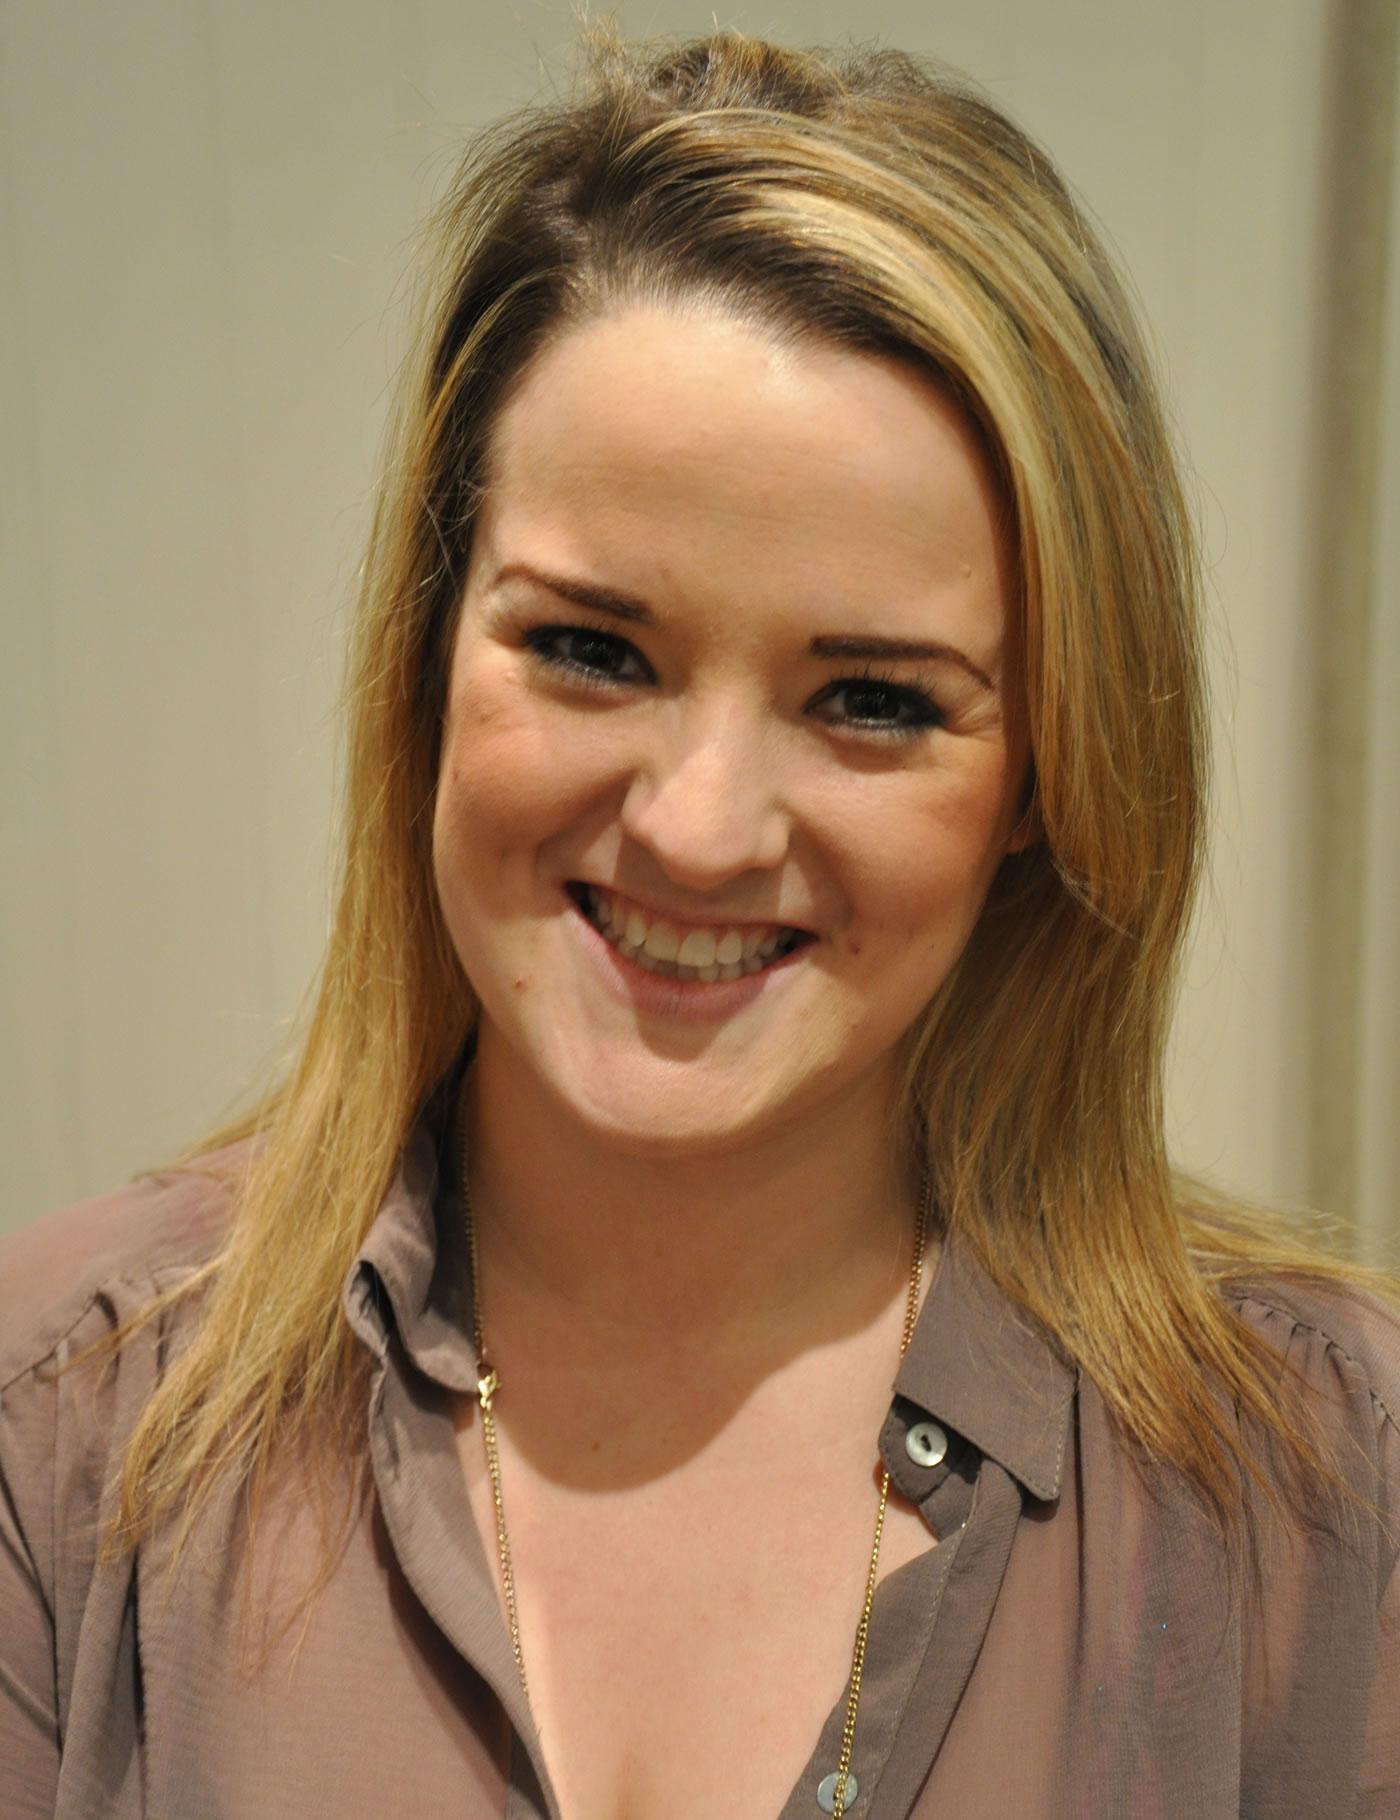 'Glee' Tour cast get hair extensions at Mark Glenn, London - Kimberley before